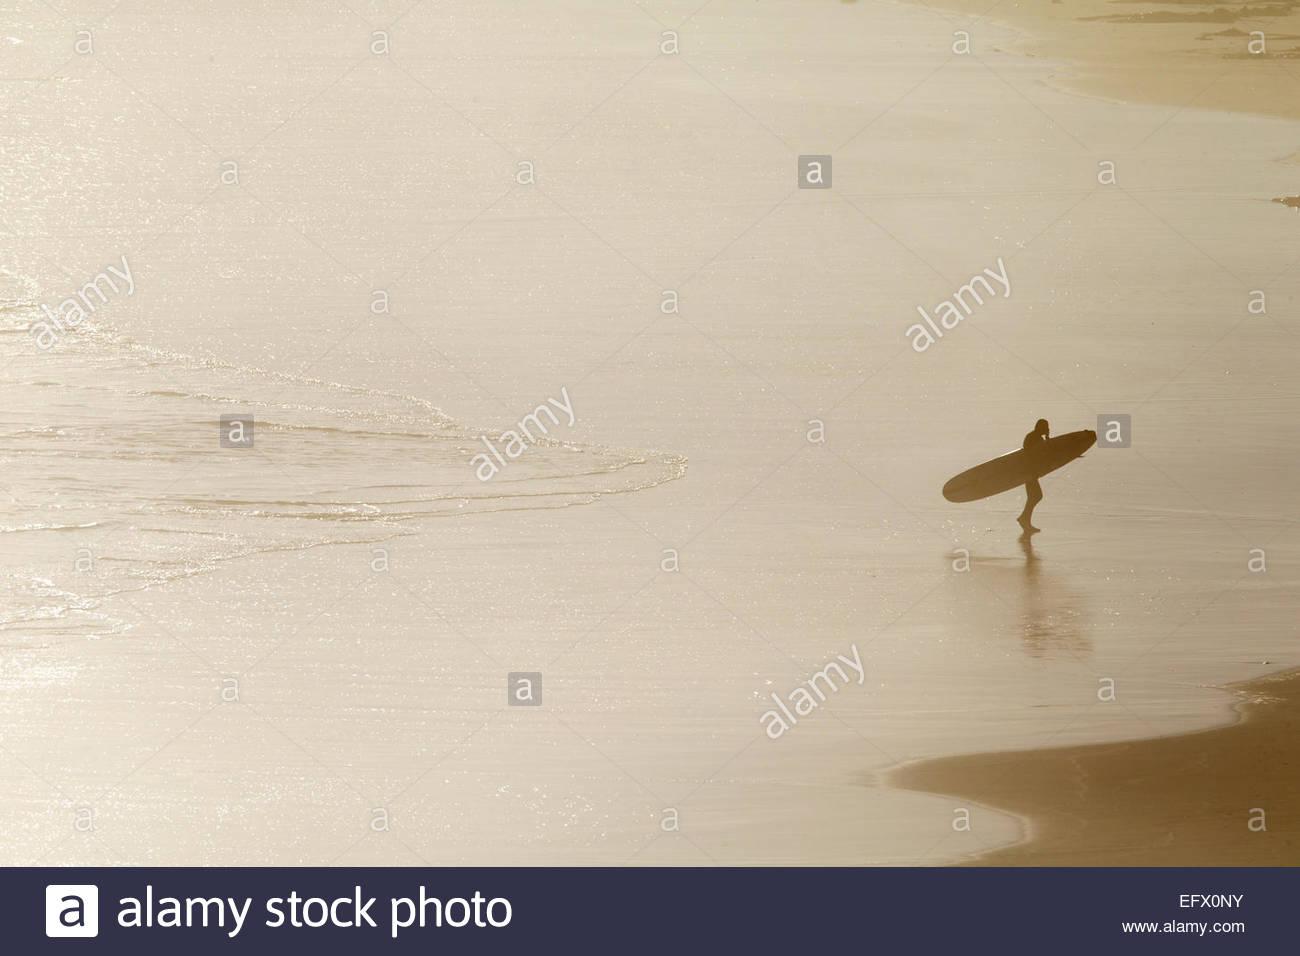 Surfer mit Surfbrett, vom Meer Strand entlang spazieren Stockbild